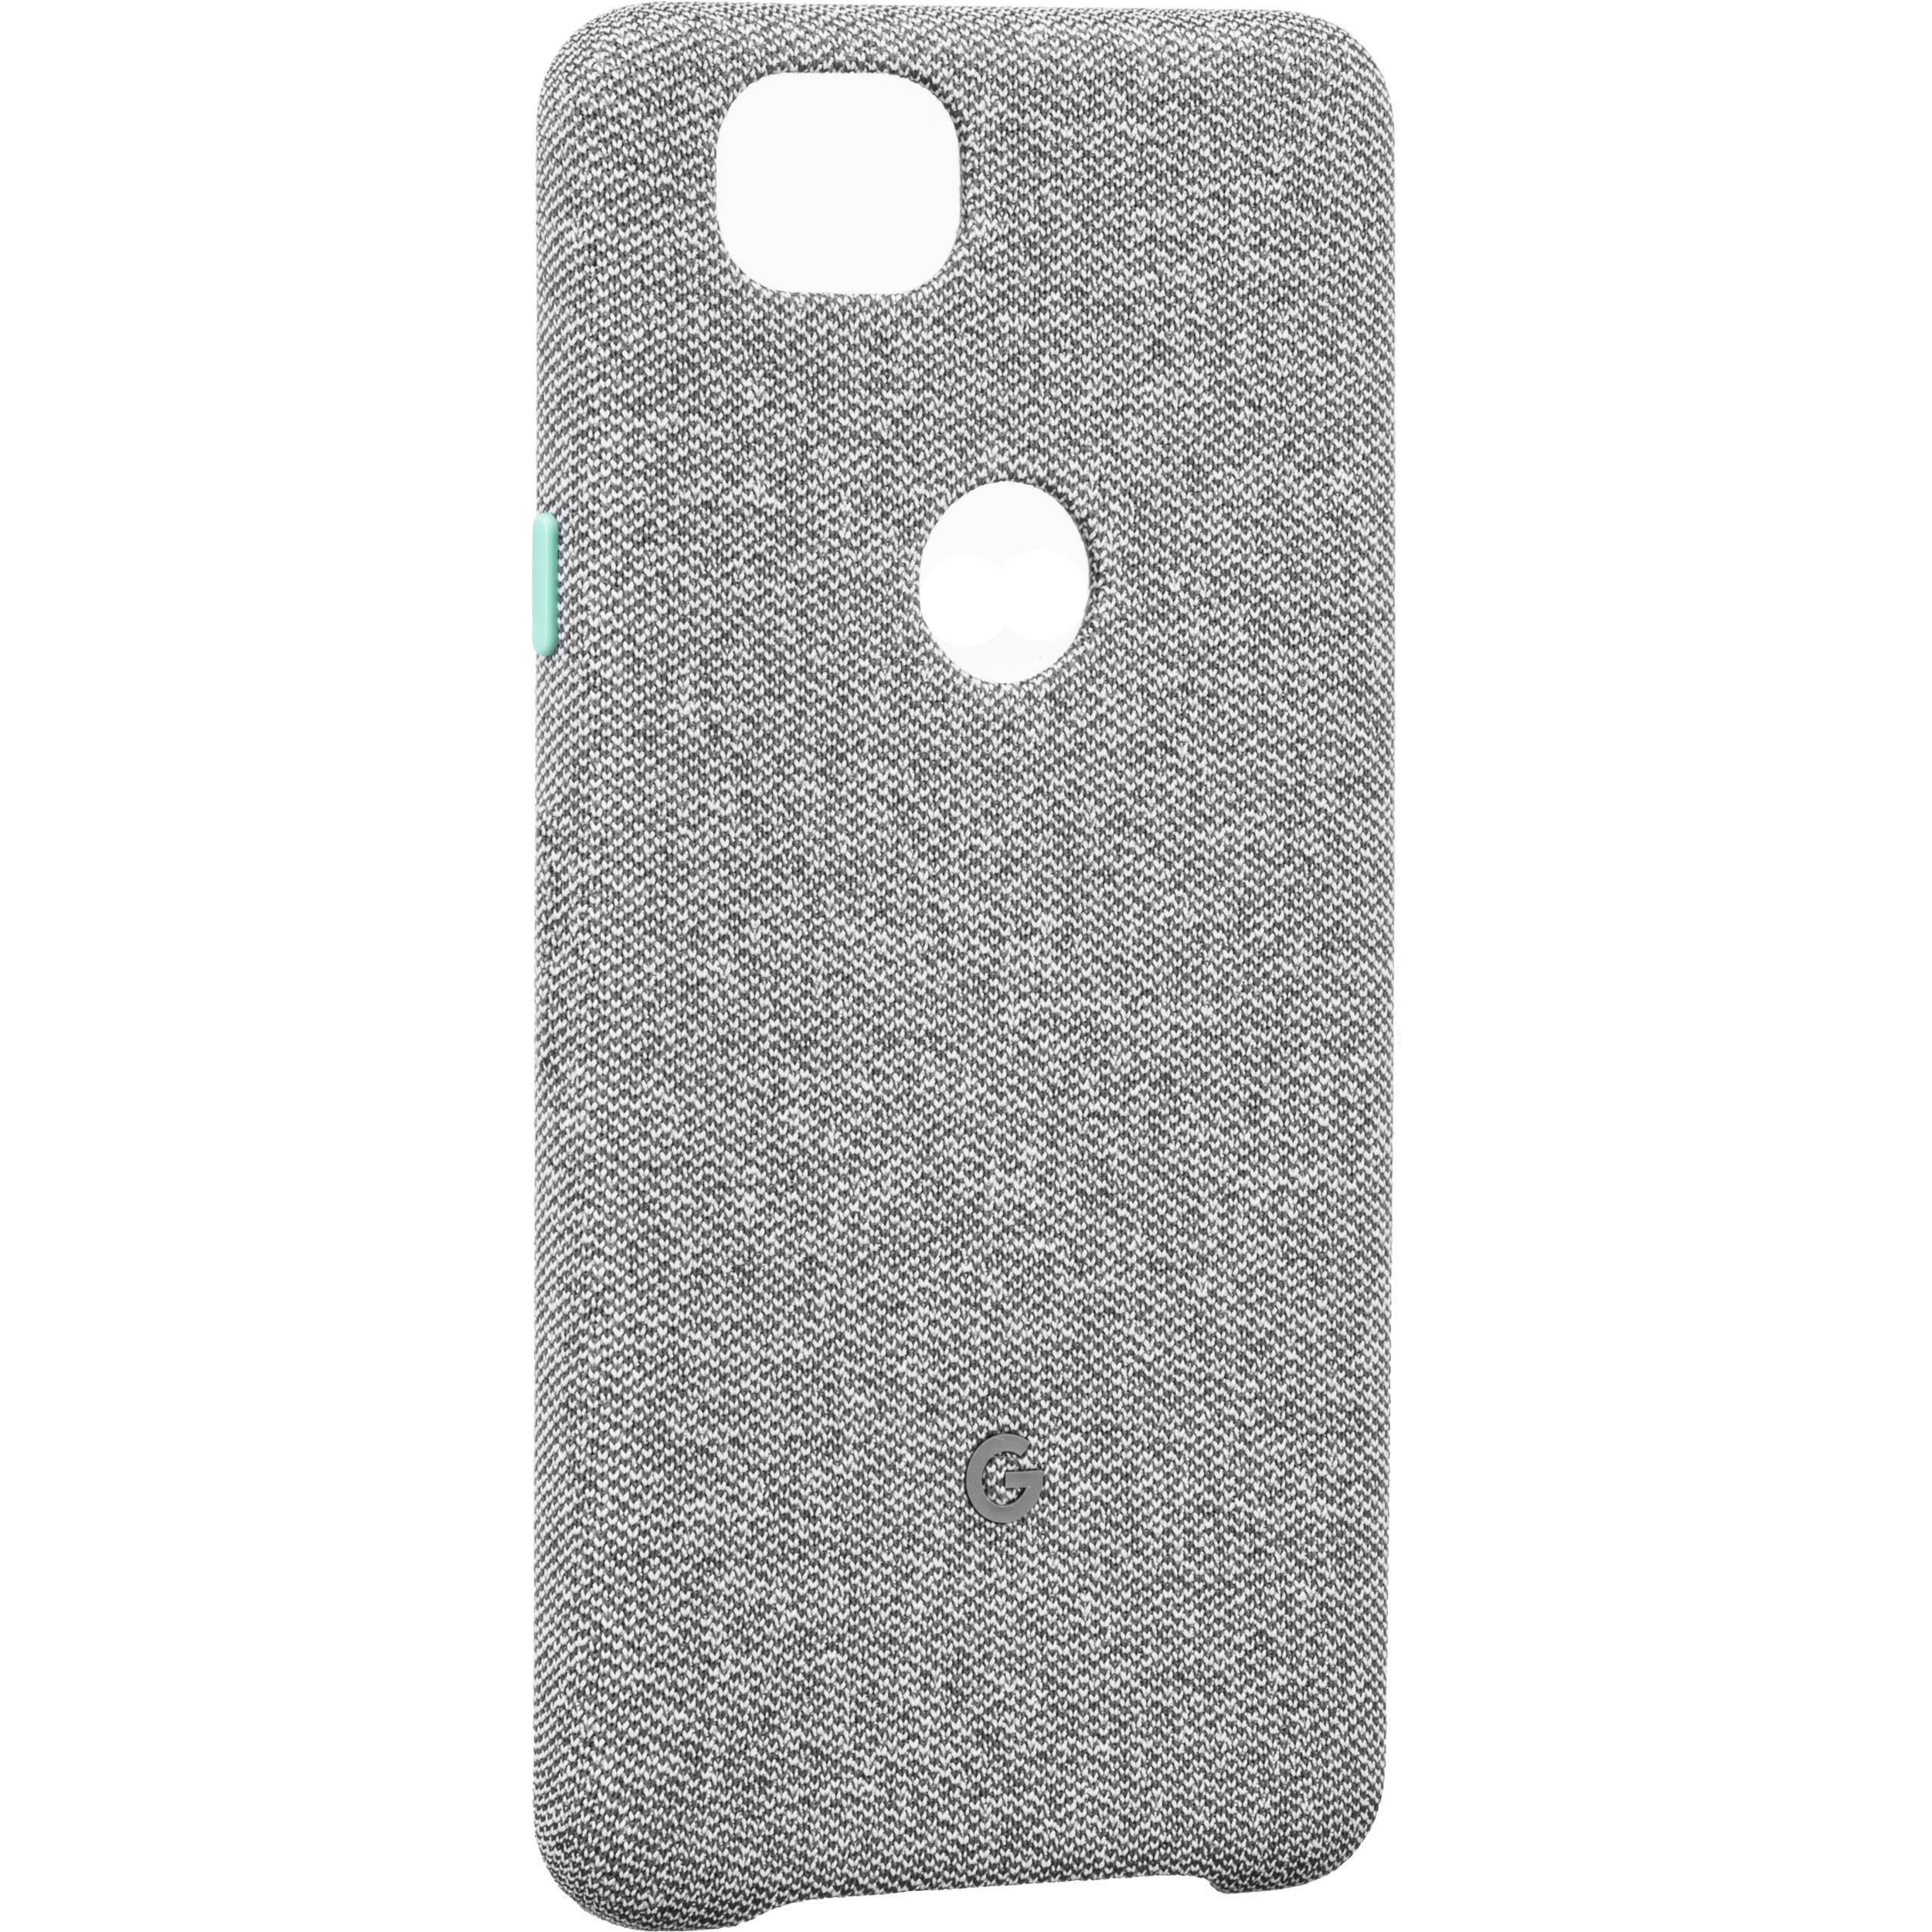 on sale 1487f eef42 Google Pixel 2 Fabric Case (Cement)